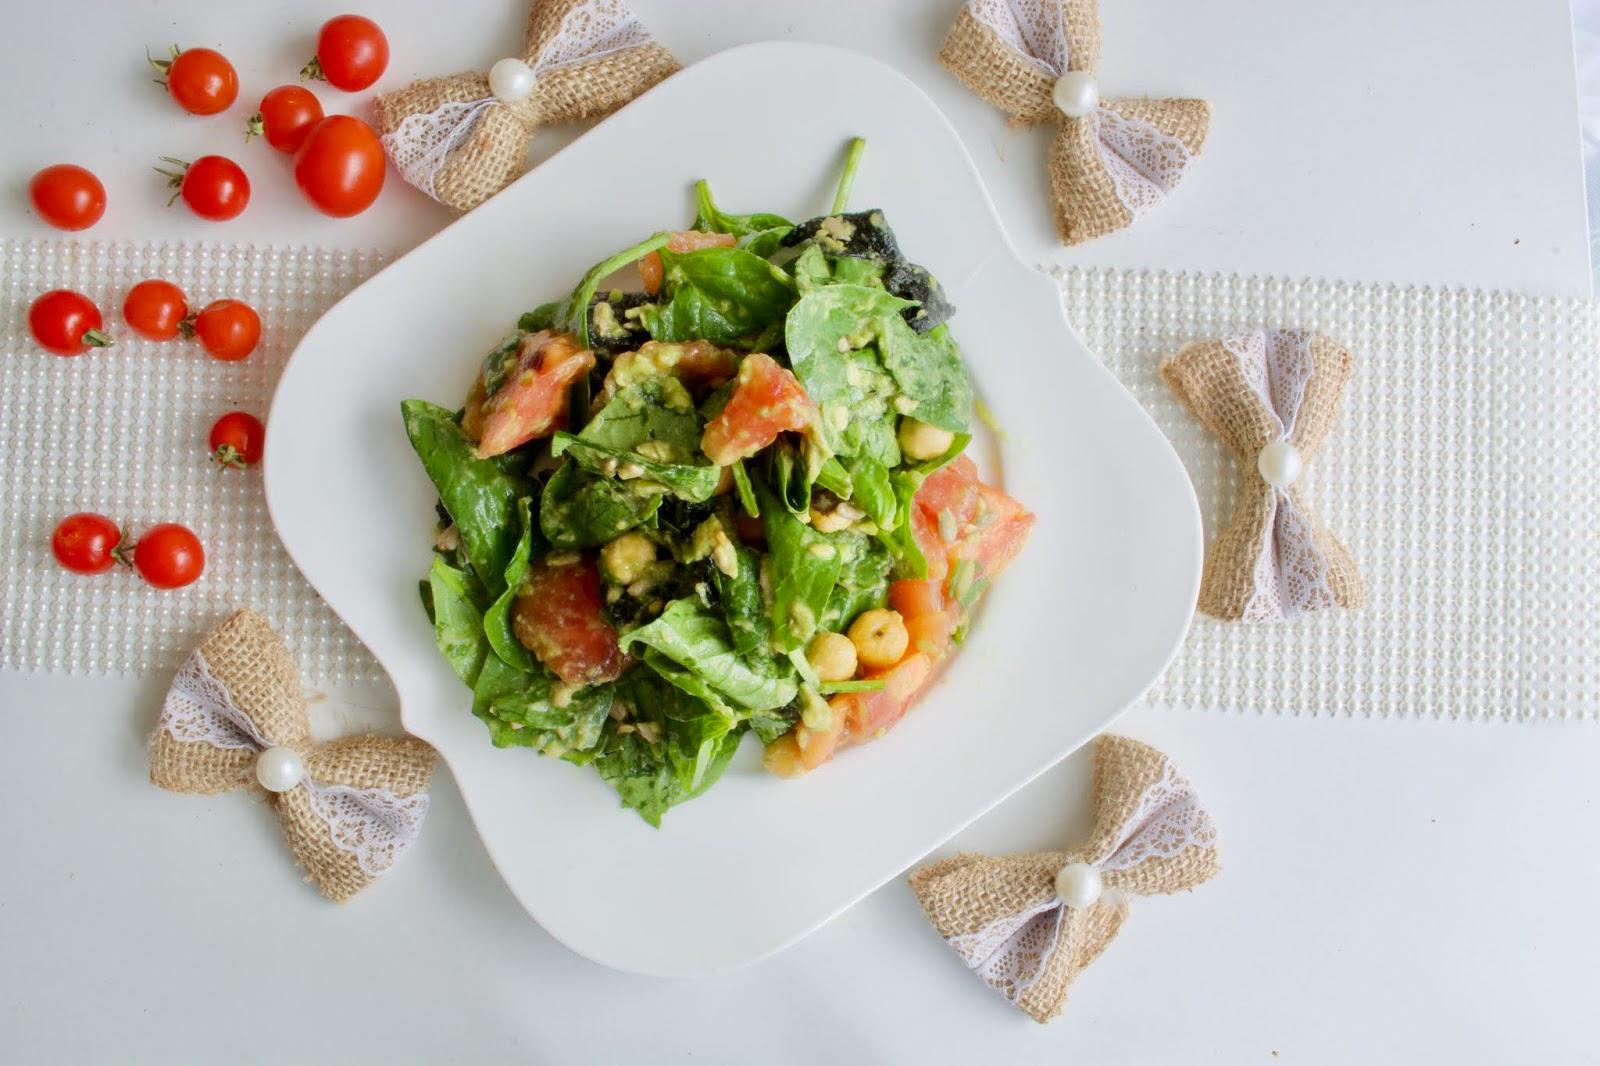 Spinach seaweed salad